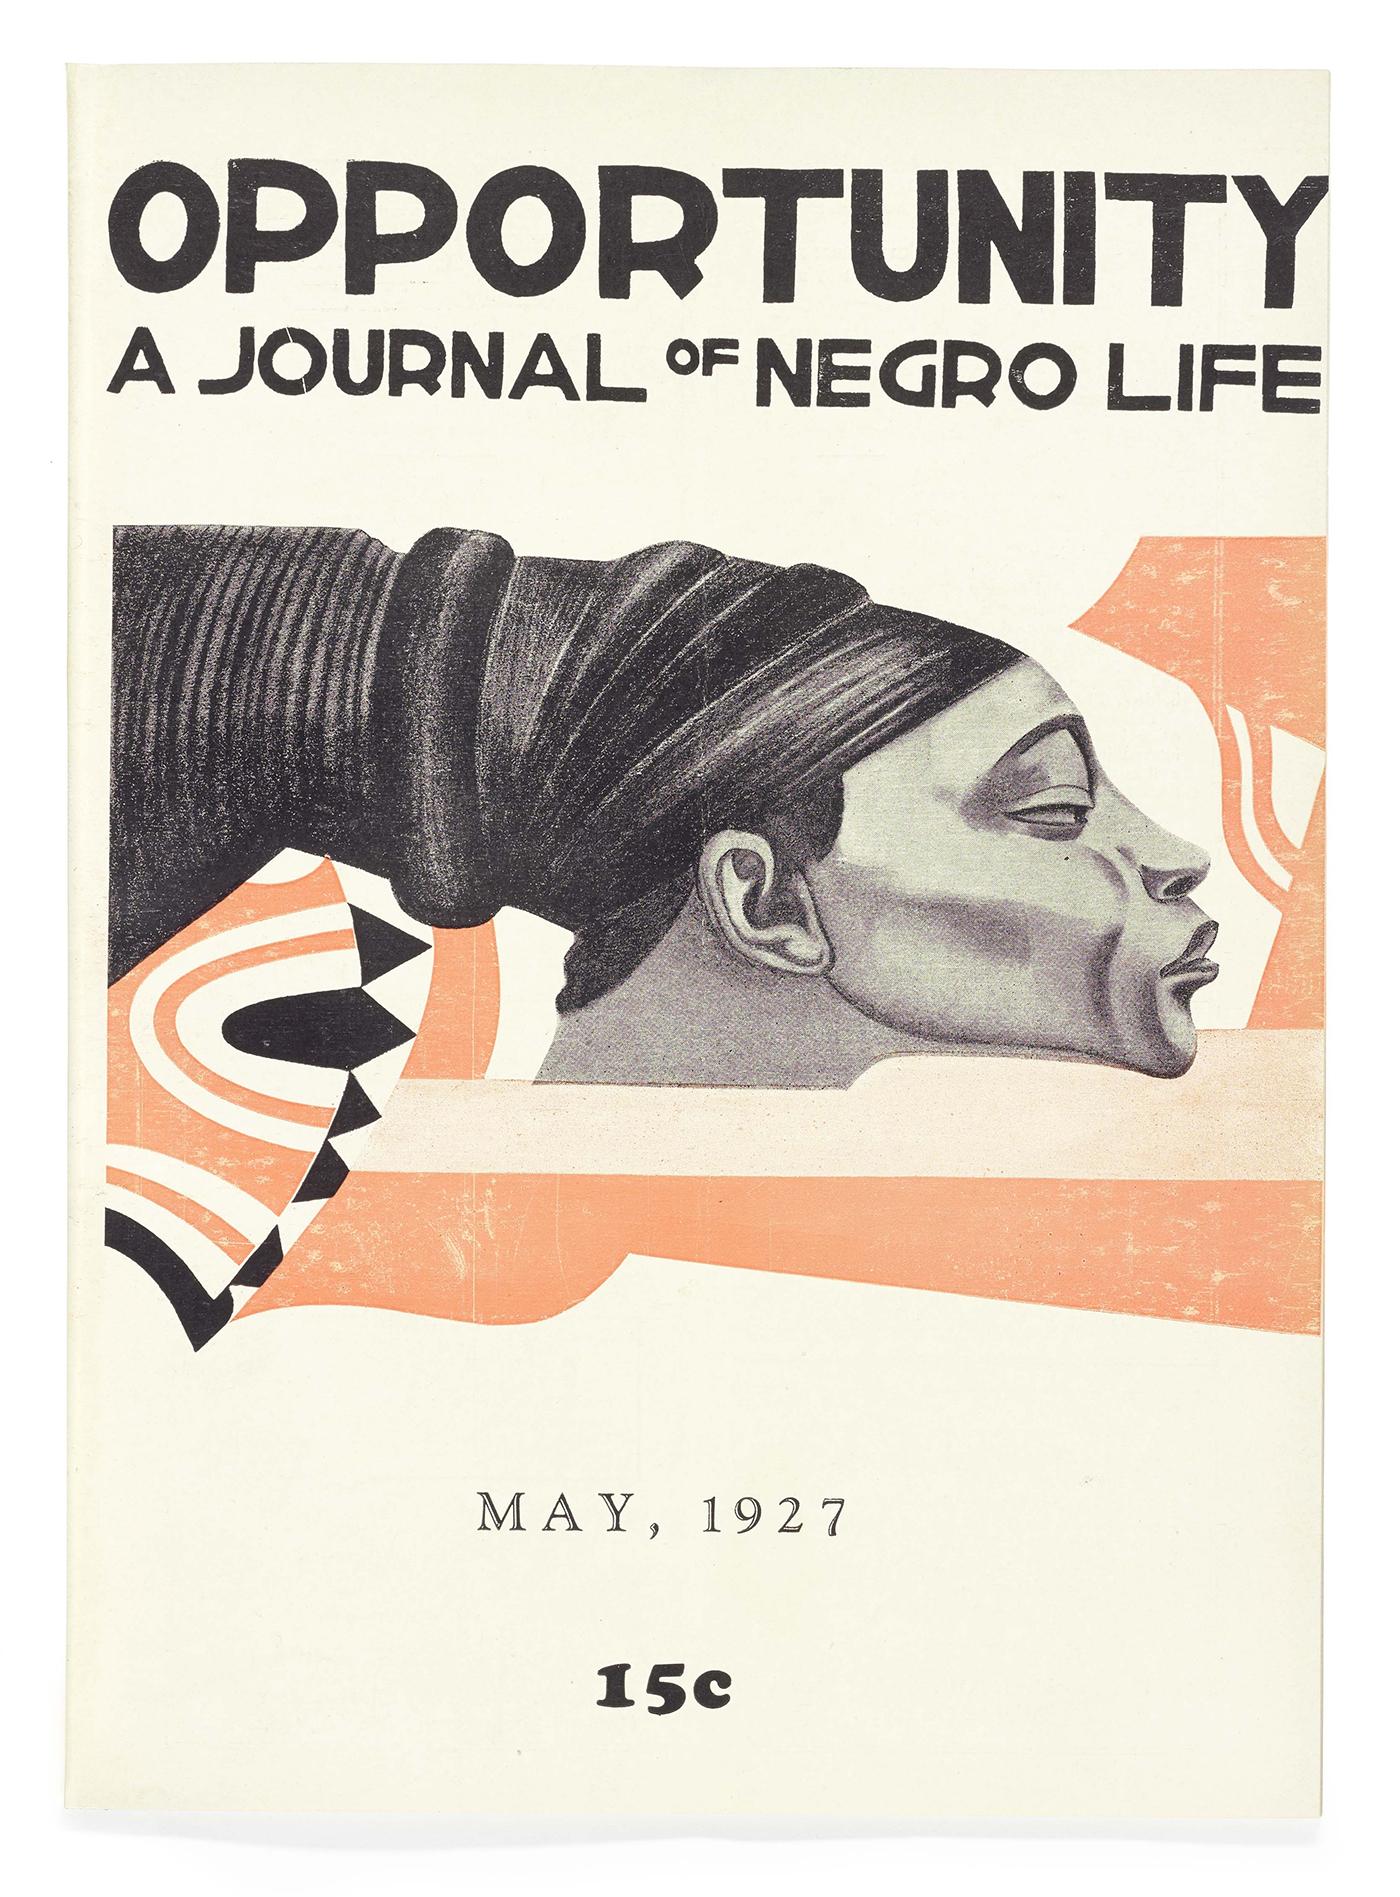 Harlem Renaissance, African American History, Black History, KOLUMN Magazine, KOLUMN